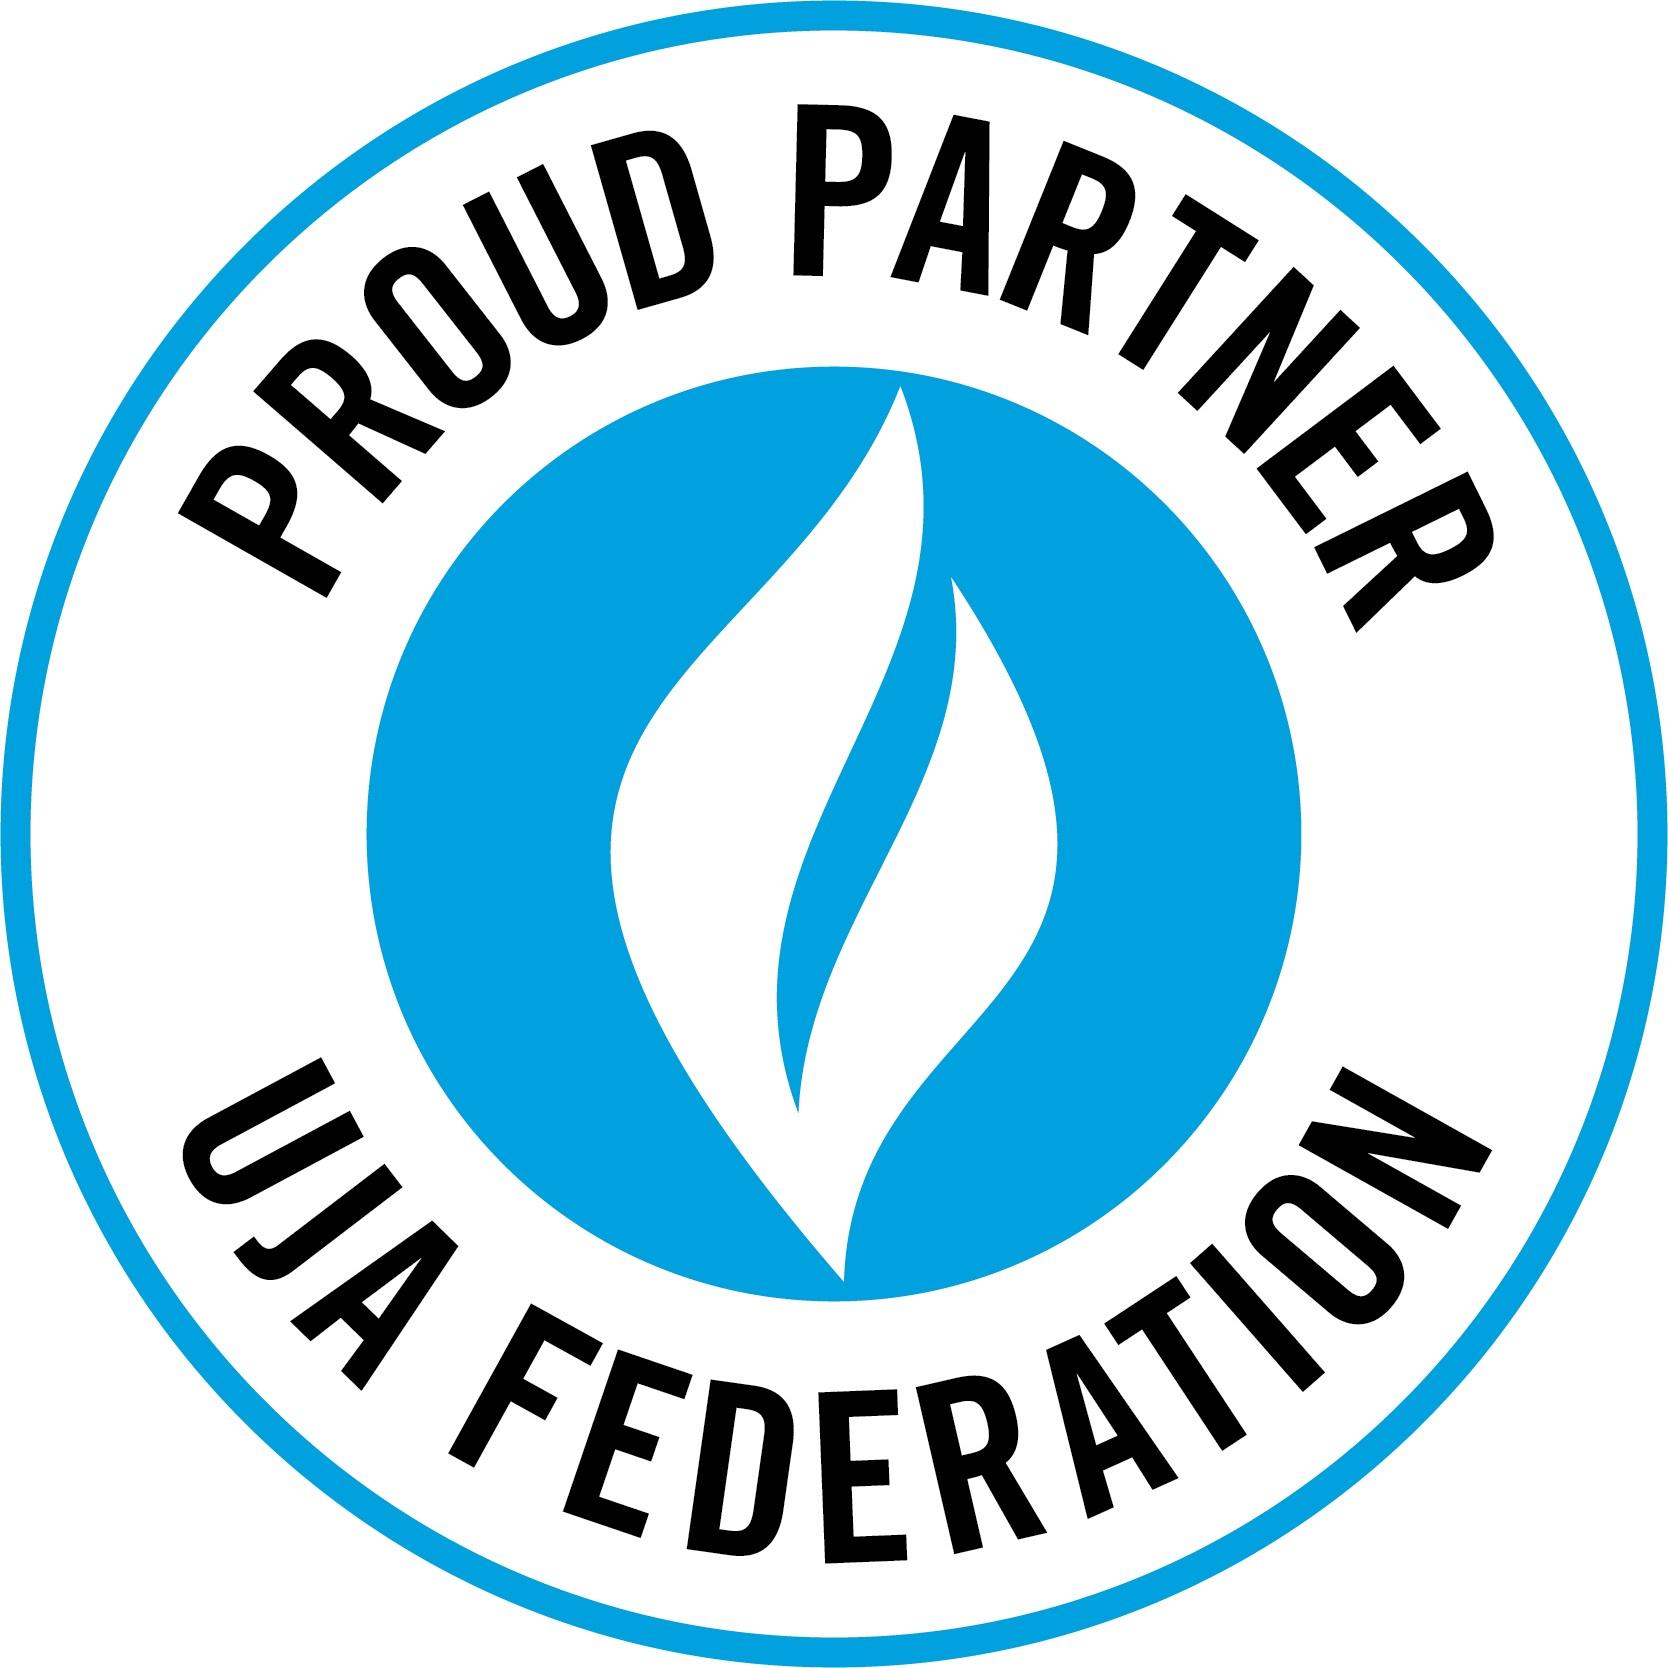 UJA_SoA_Proud_Partner_primary_RGB.jpg